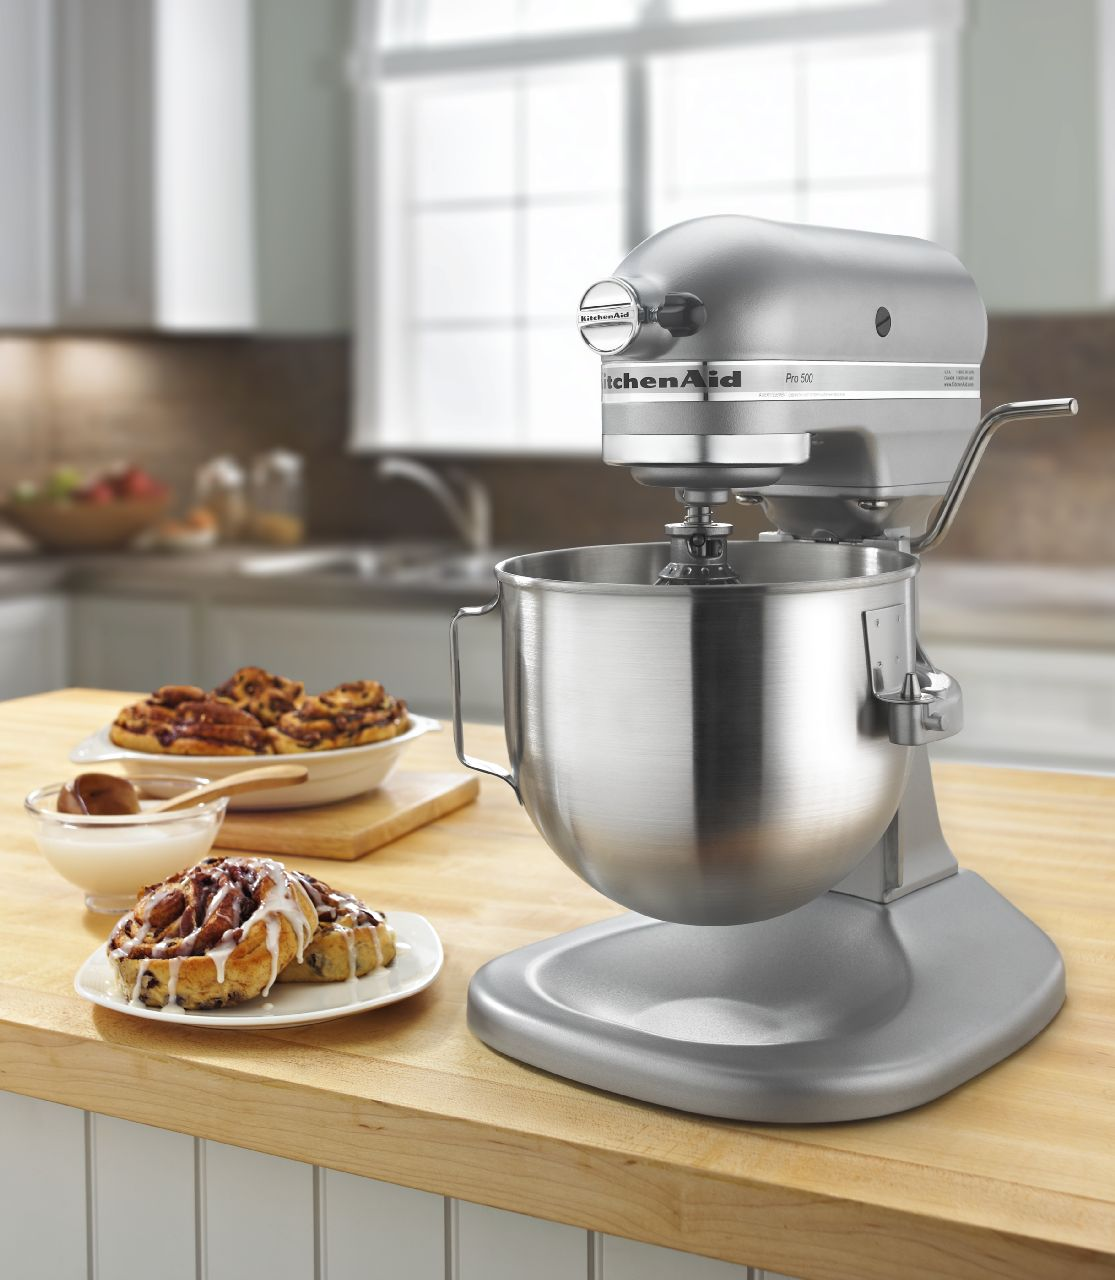 KitchenAid 5 Qt. Pro 500 Series Silver Stand Mixer